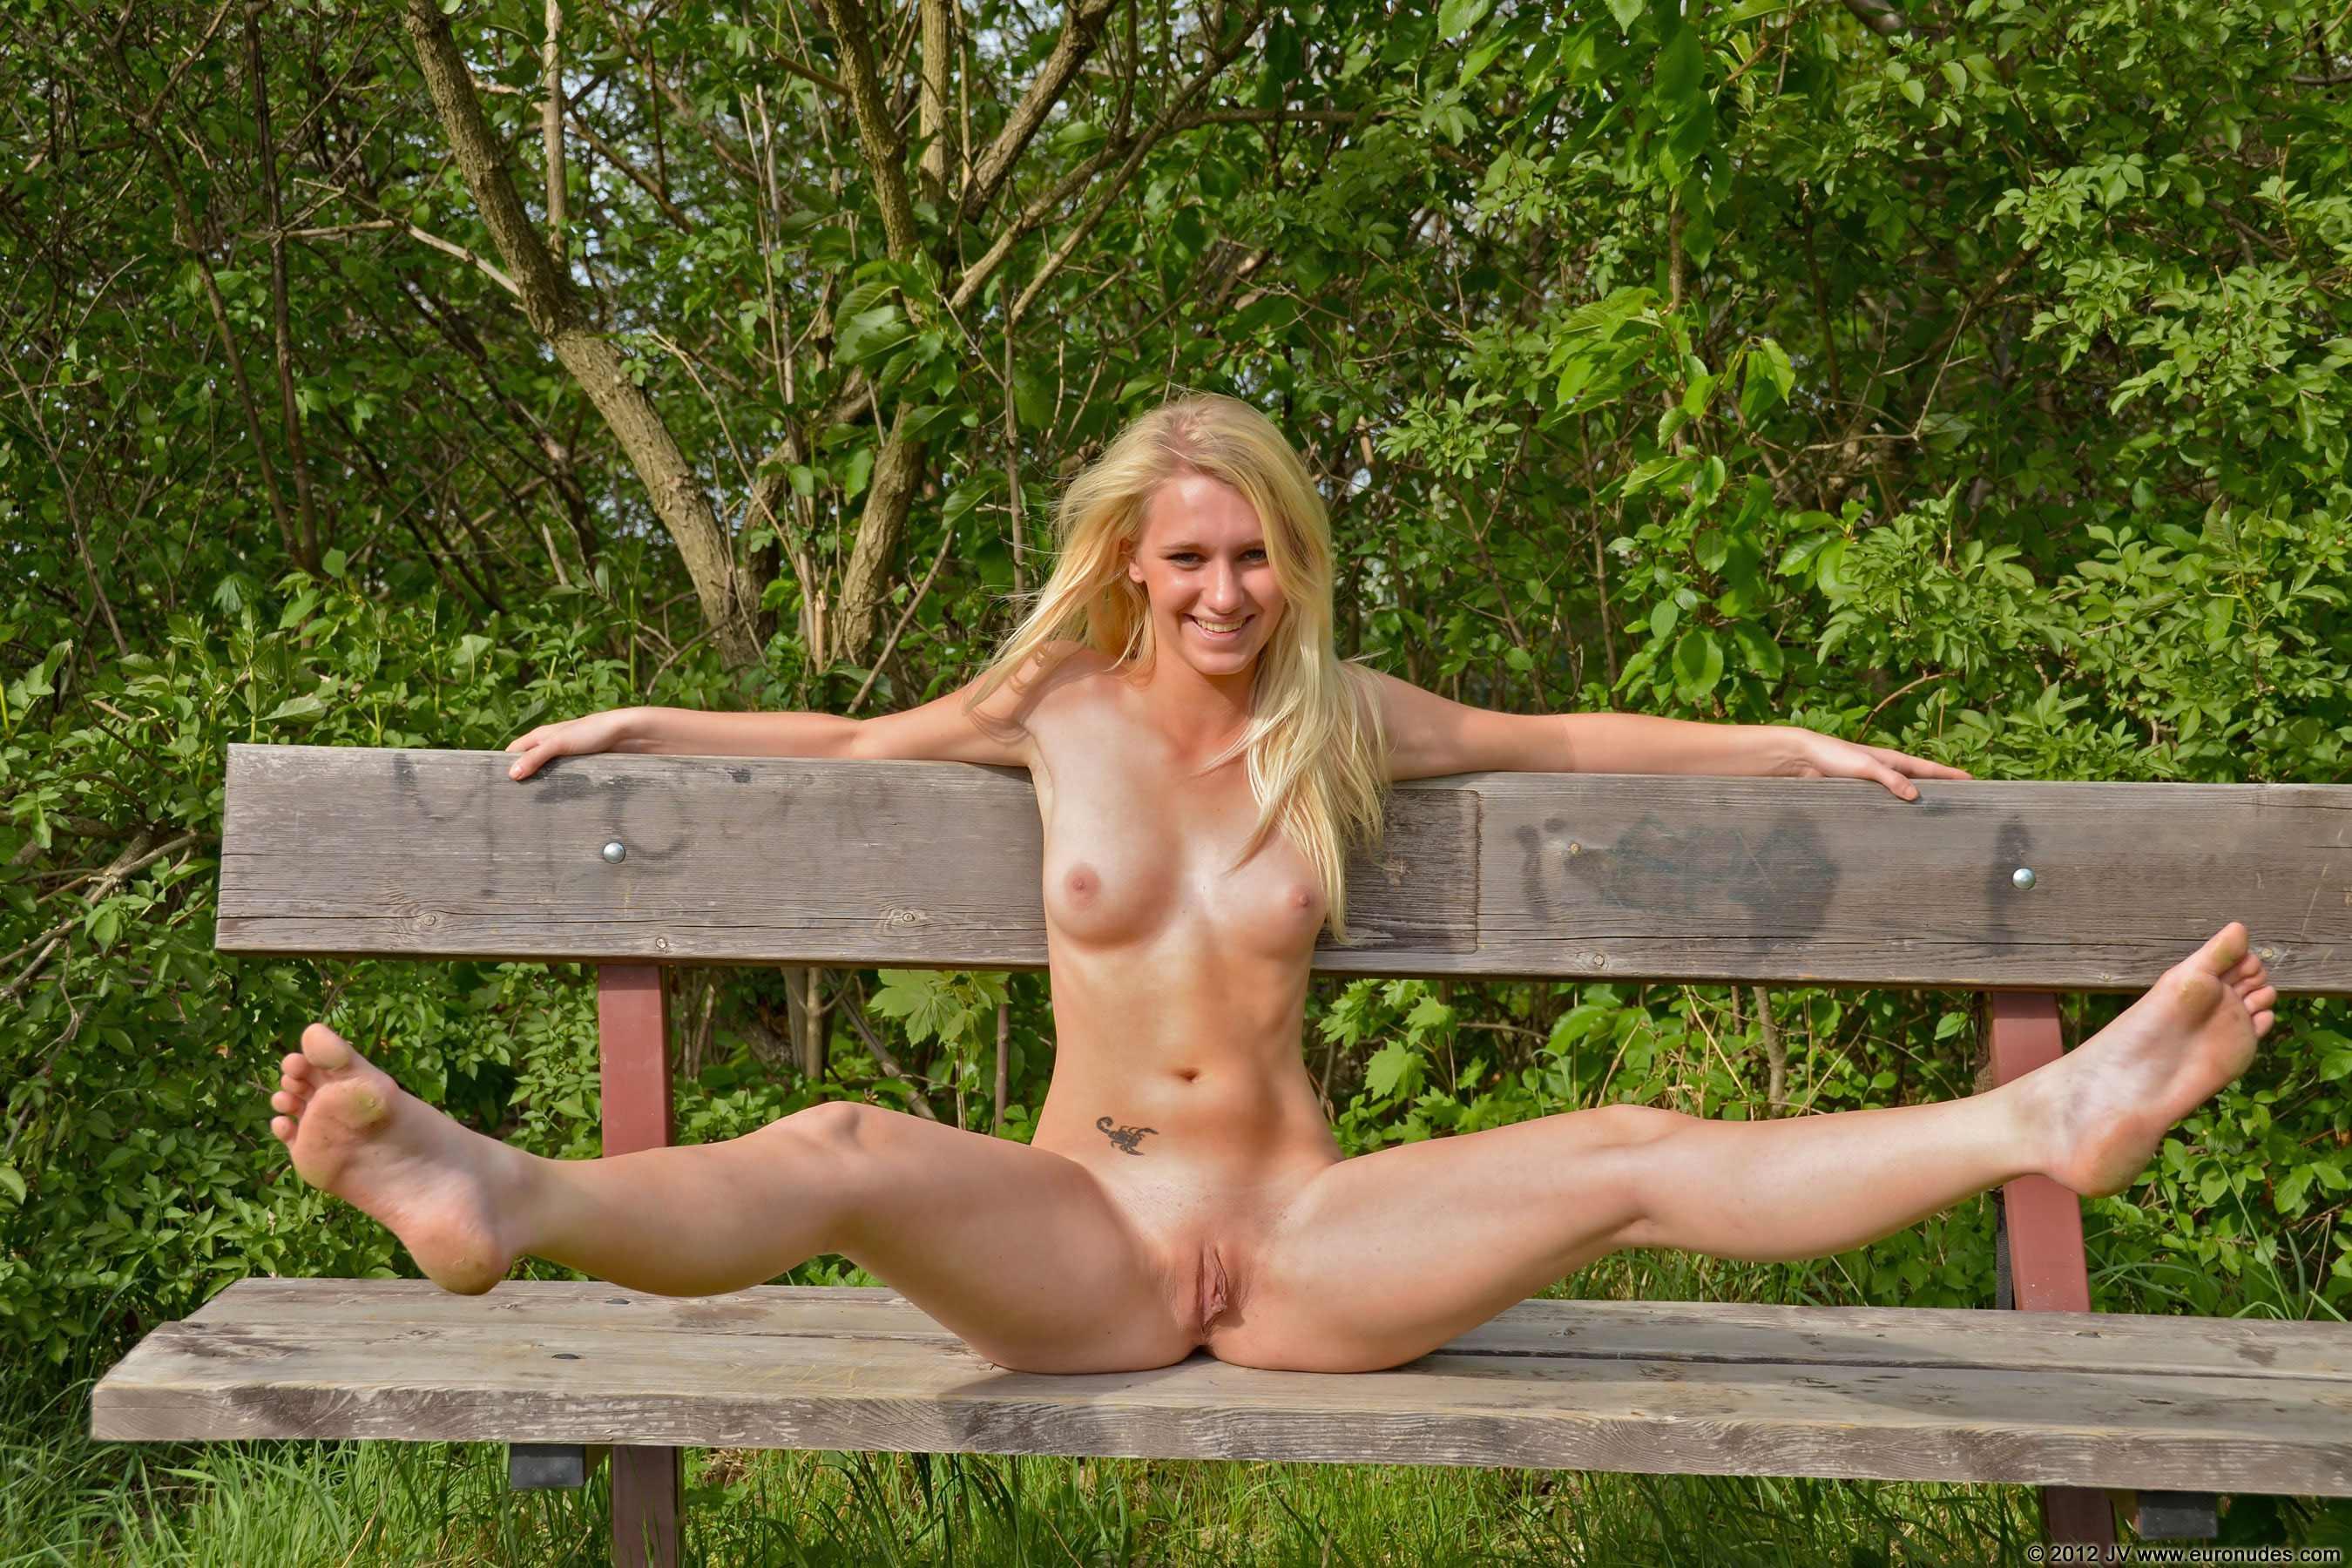 mallu porn actresses naked